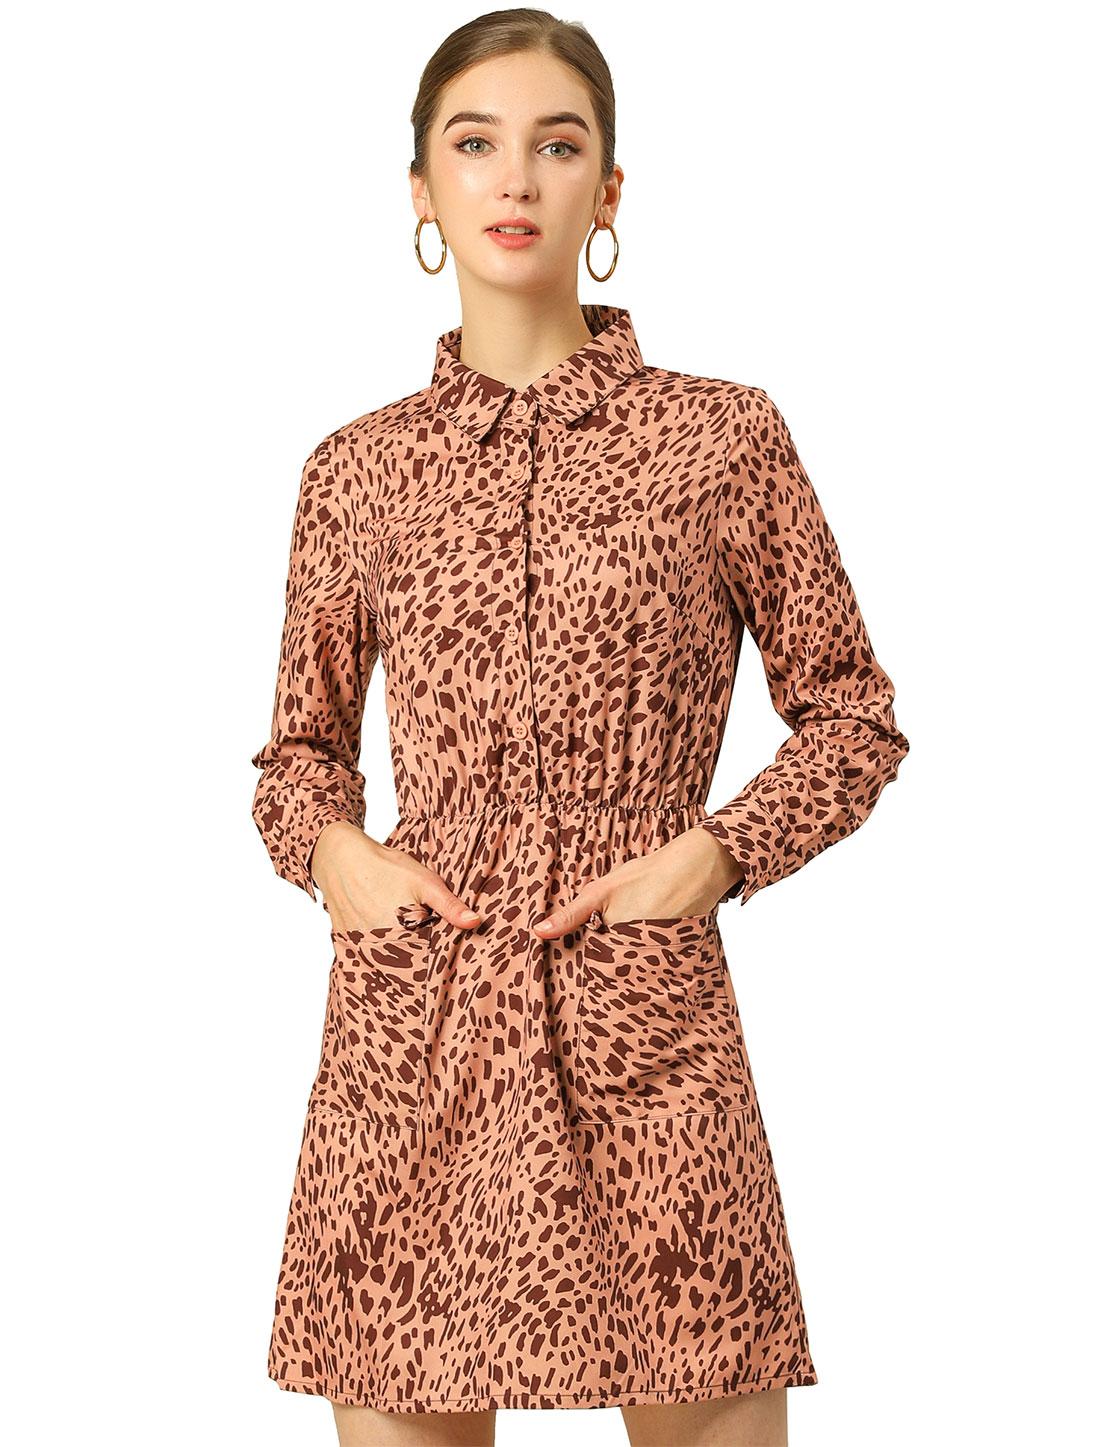 Allegra K Womens Leopard Prints Pocket Above Knee A Line Dress Brown L